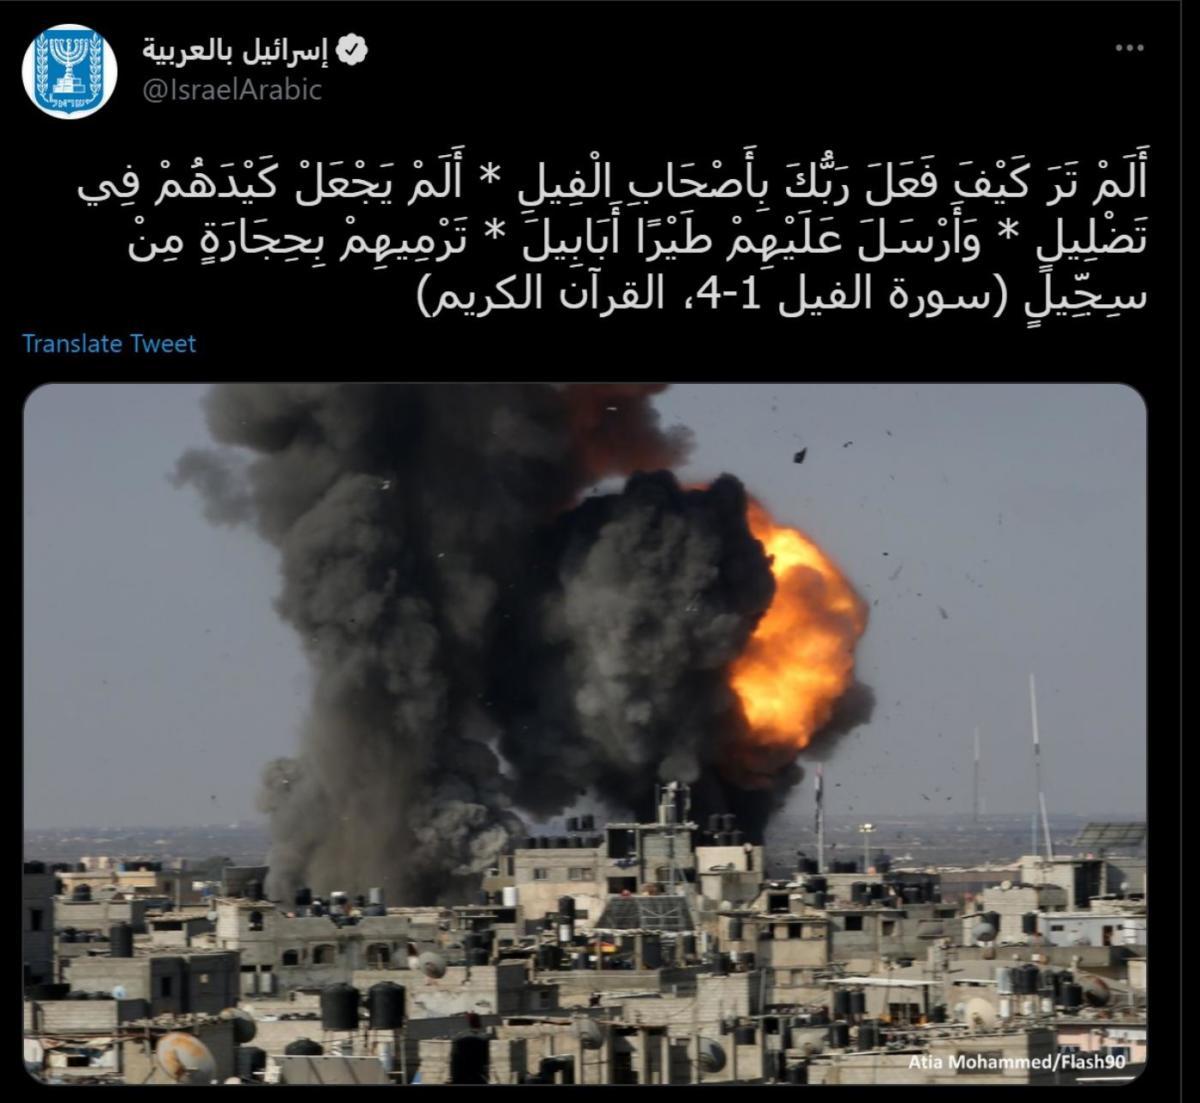 QuranIsraelTweet